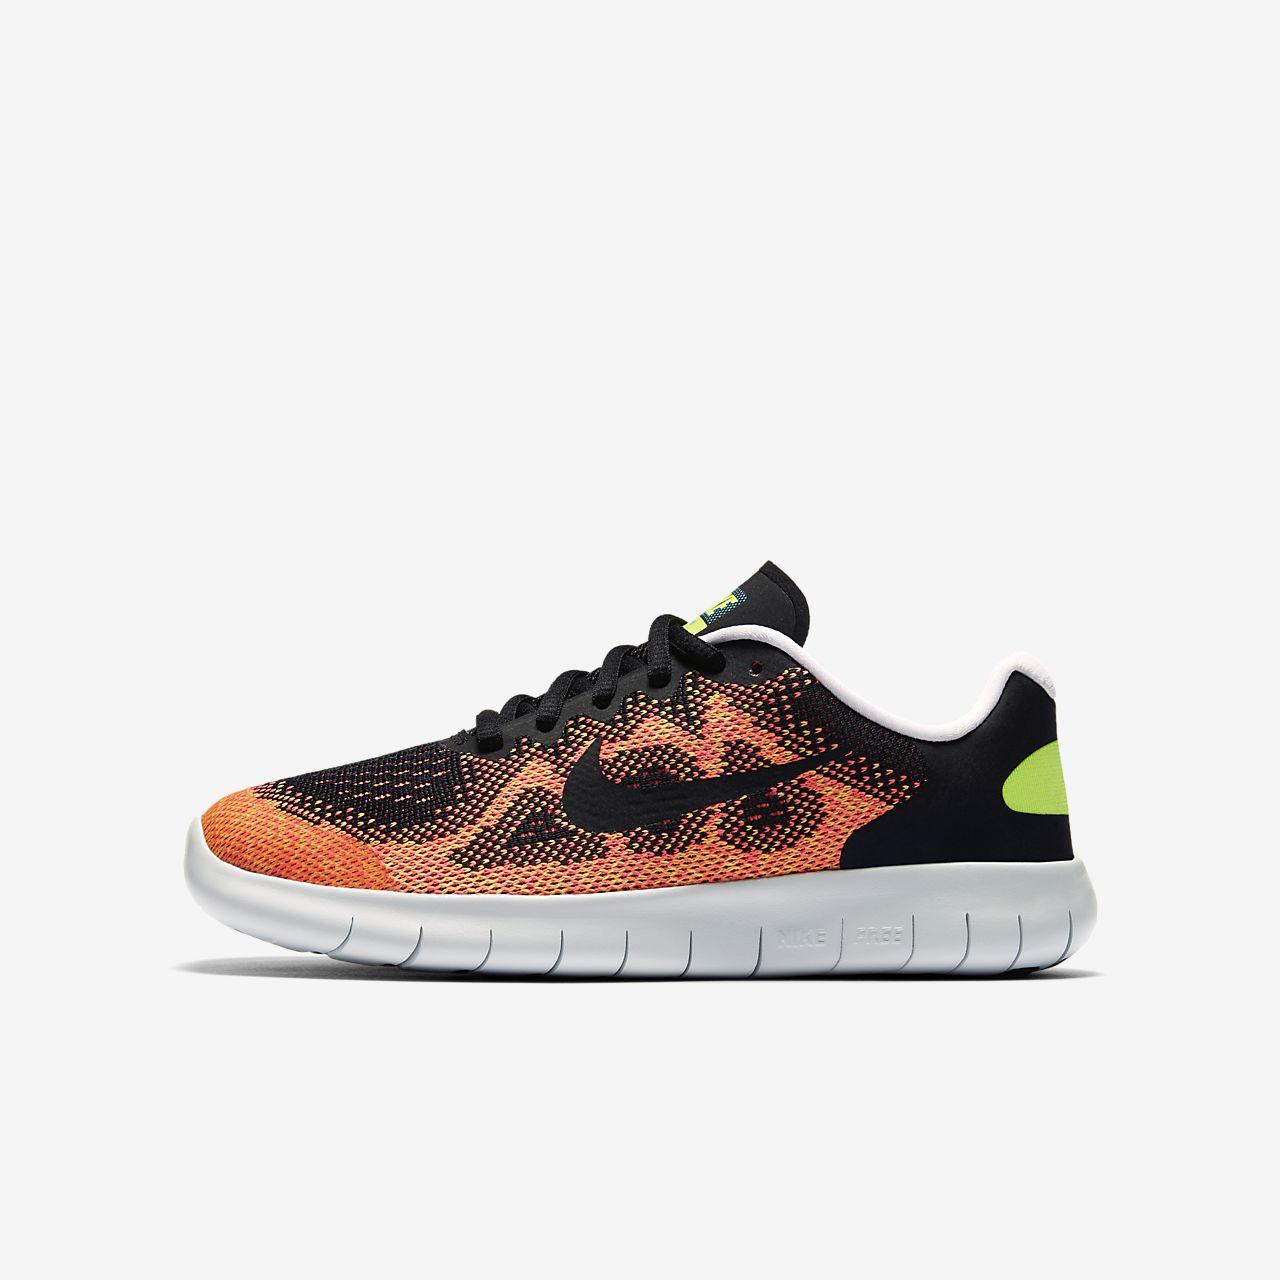 ... Scarpa da running Nike Free RN 2017 - Ragazzi